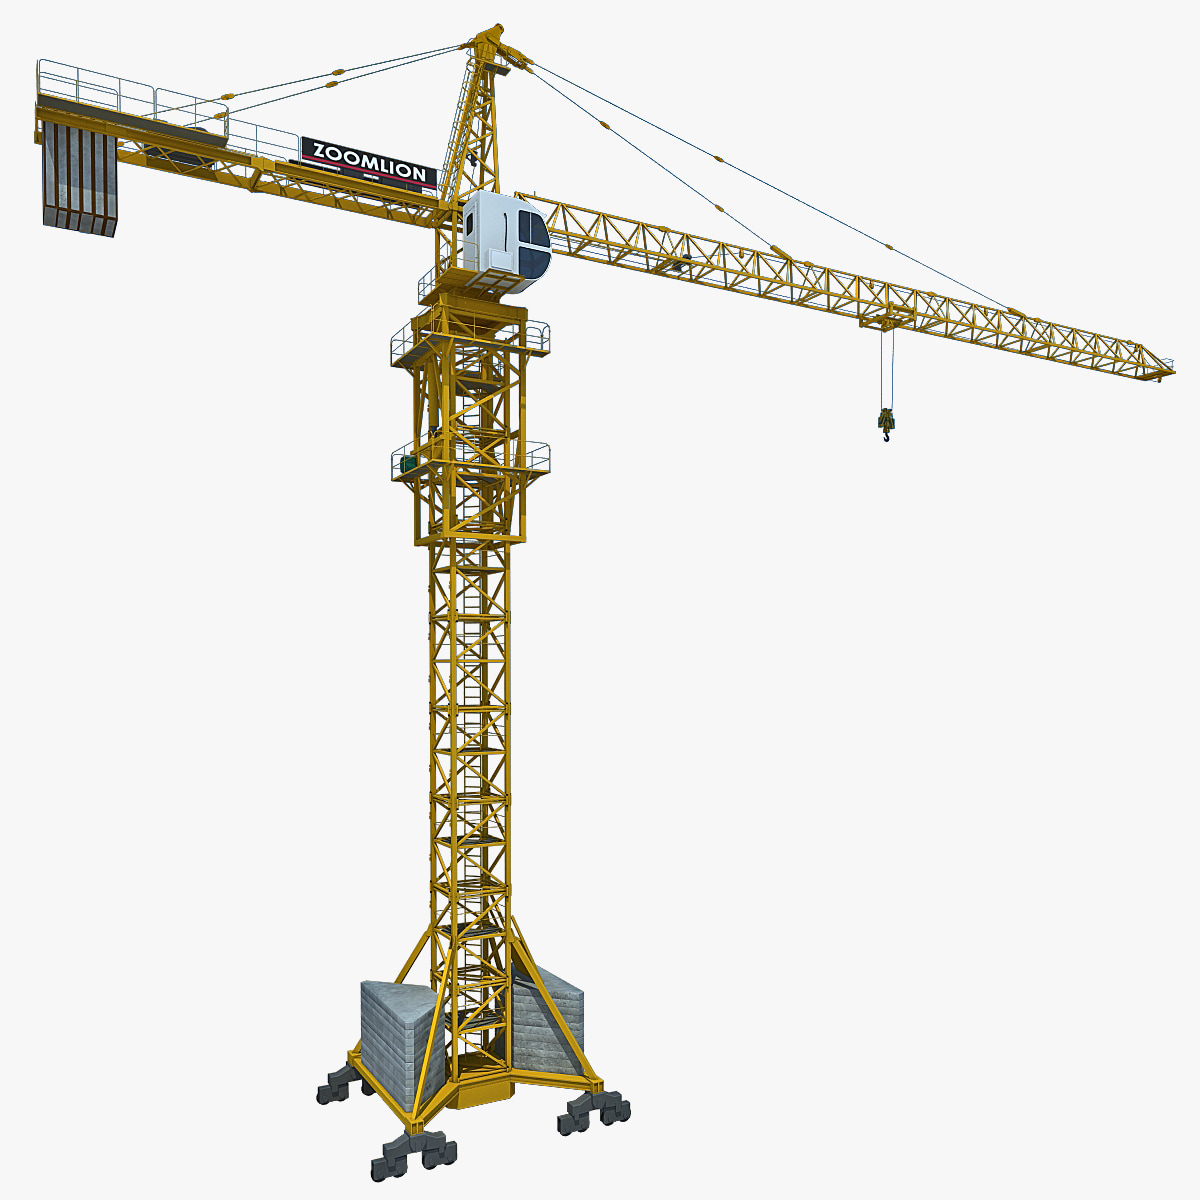 Tower crane animation : Tower crane d model